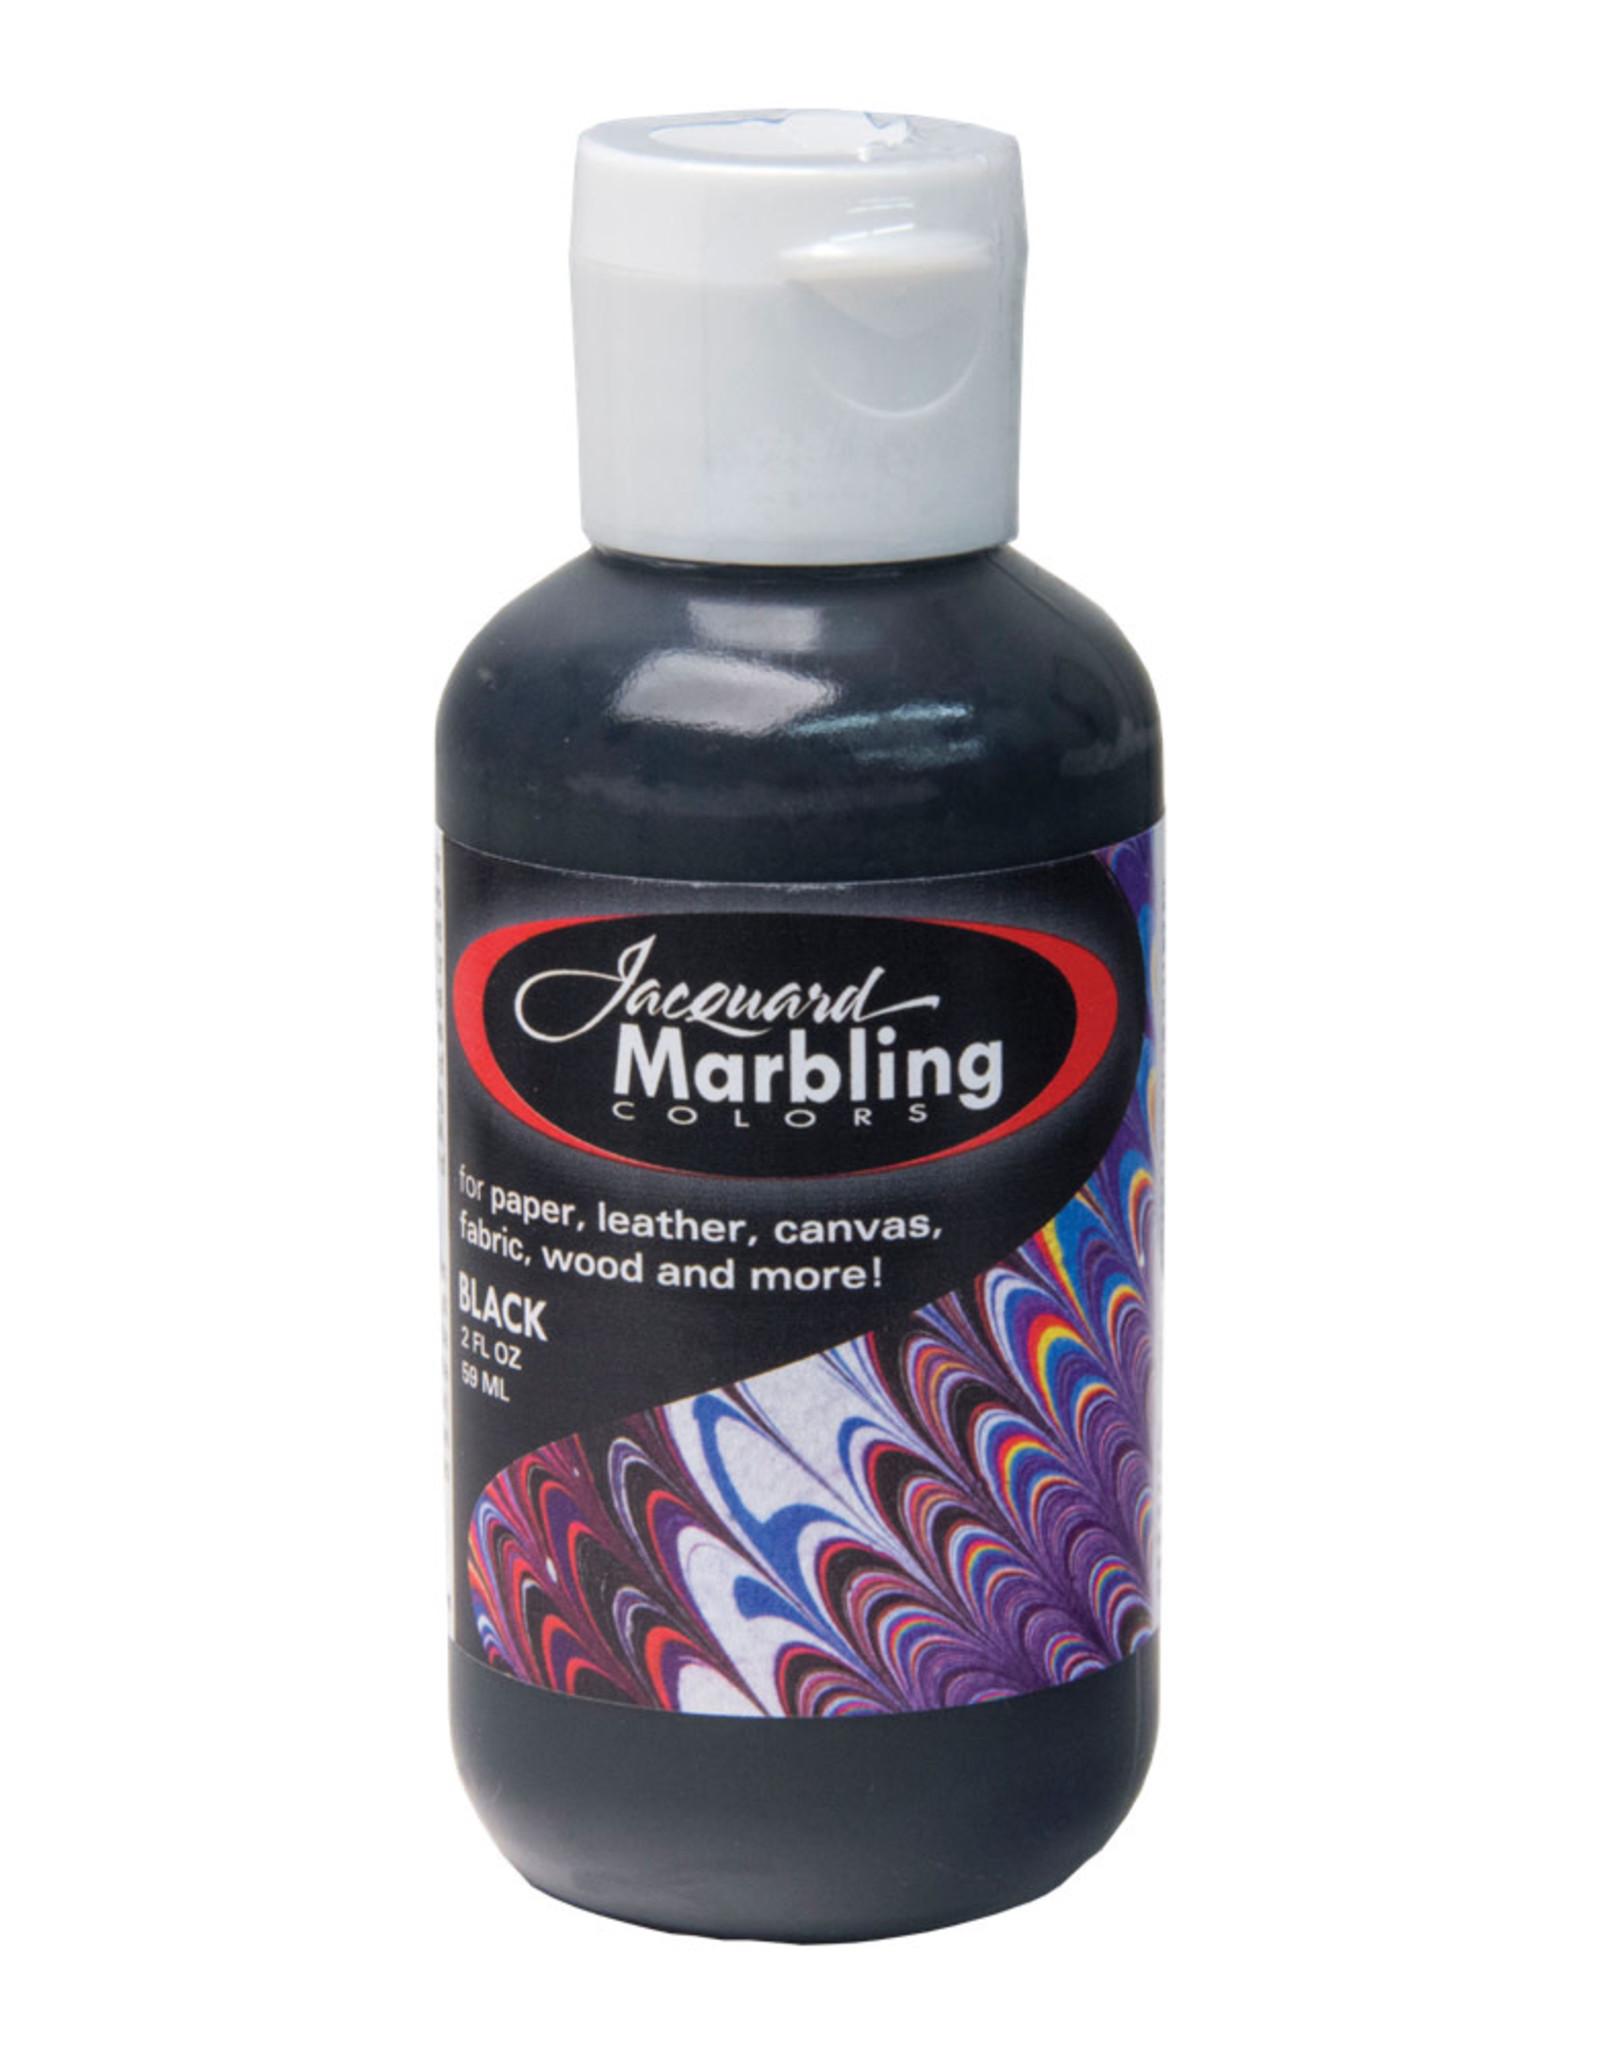 Jacquard Marbling Color Black